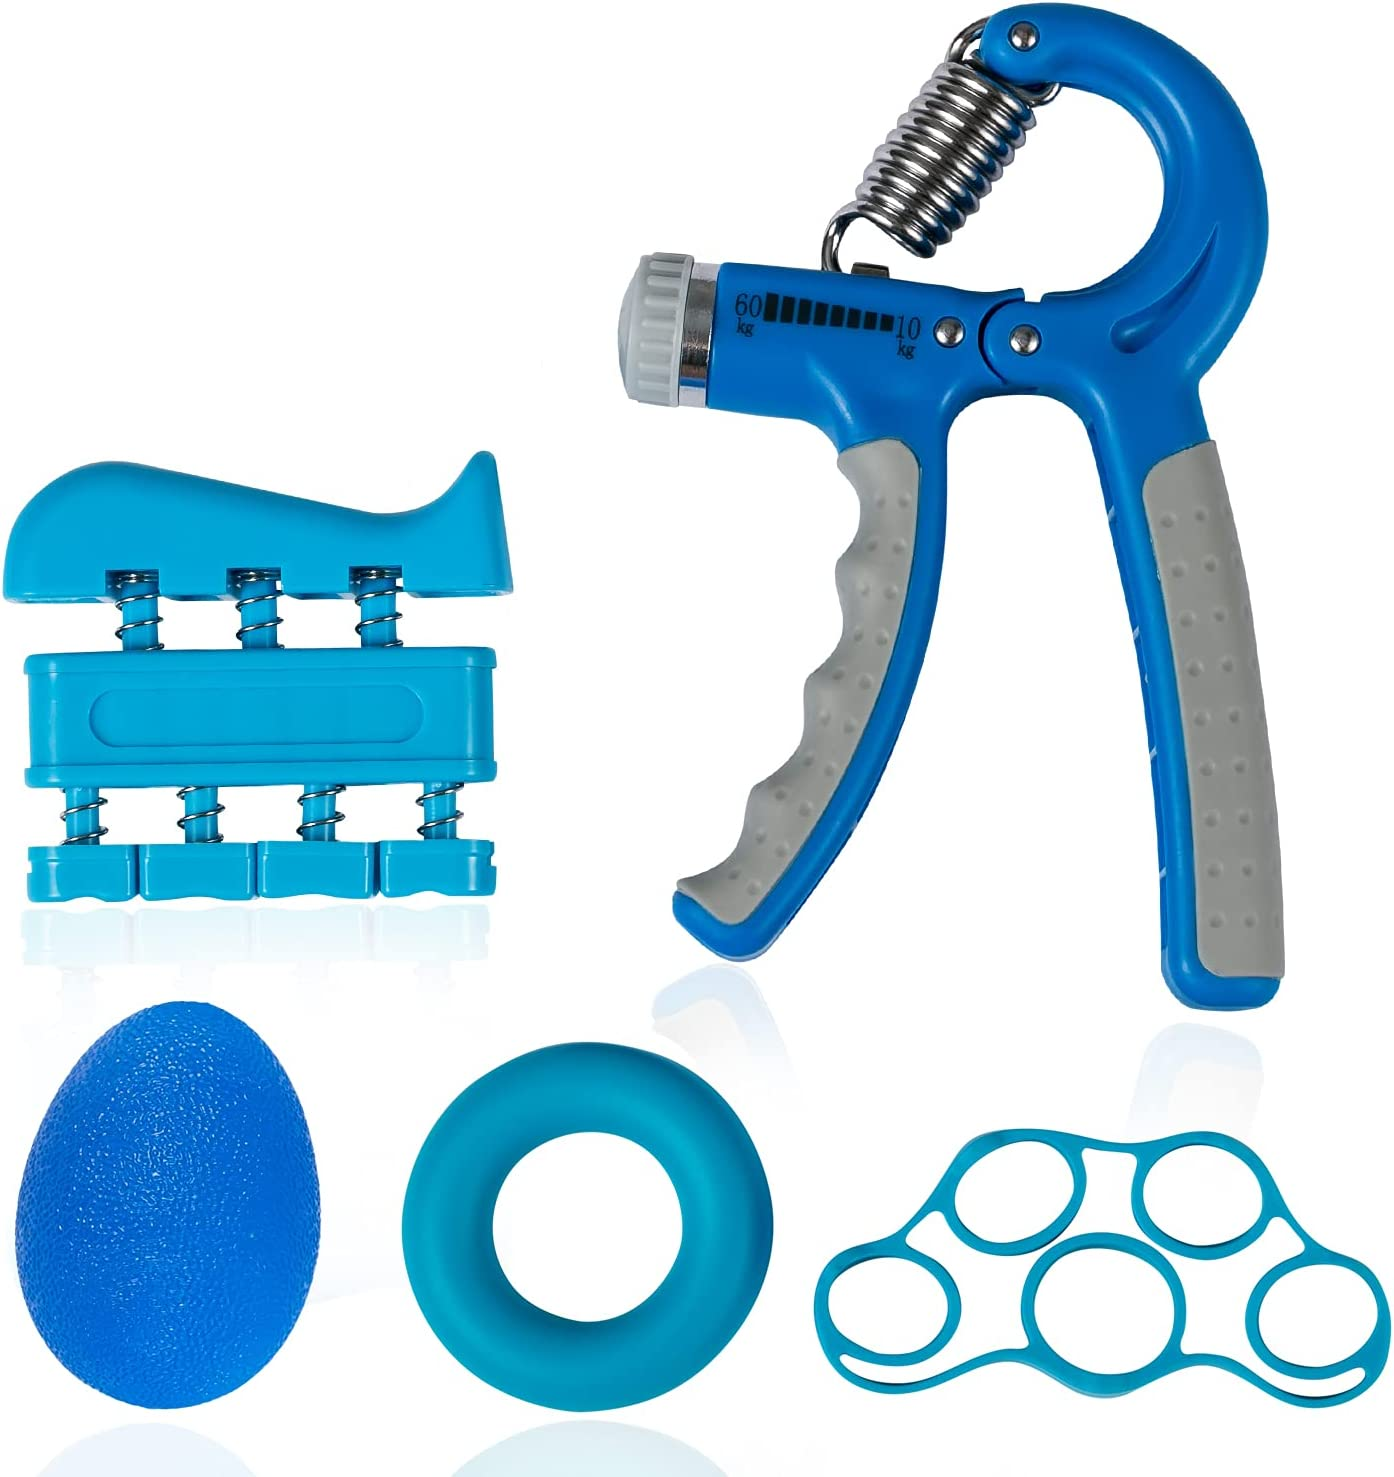 Miss CassieMiss Kiki Grip Strength Trainer Gr Outlet SALE Kit 5 Pack Hand Special sale item